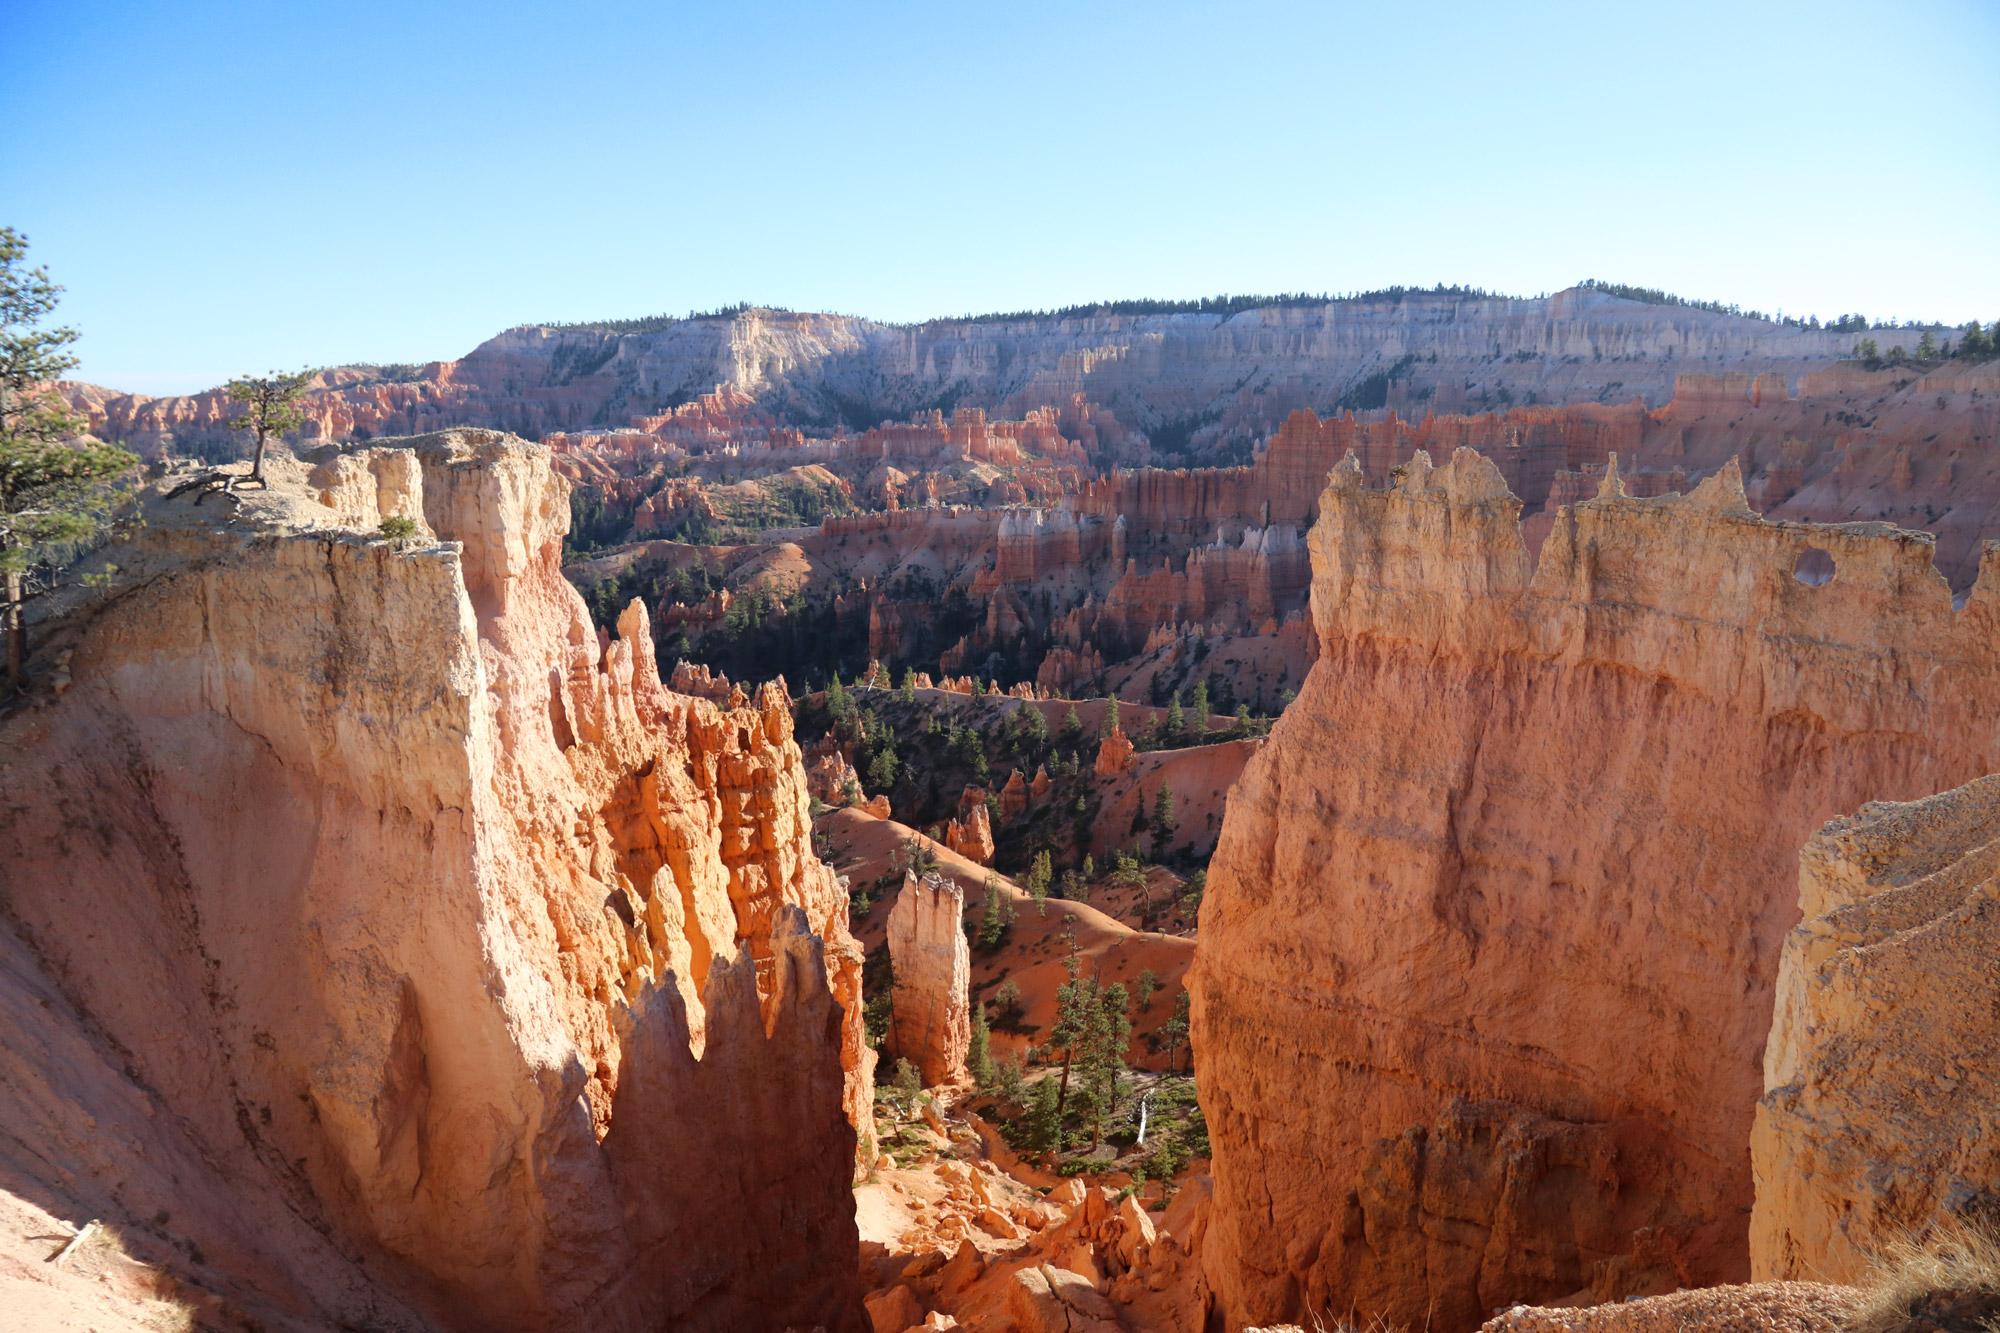 Amerika dag 14 - Bryce Canyon National Park - Queens Garden Trail